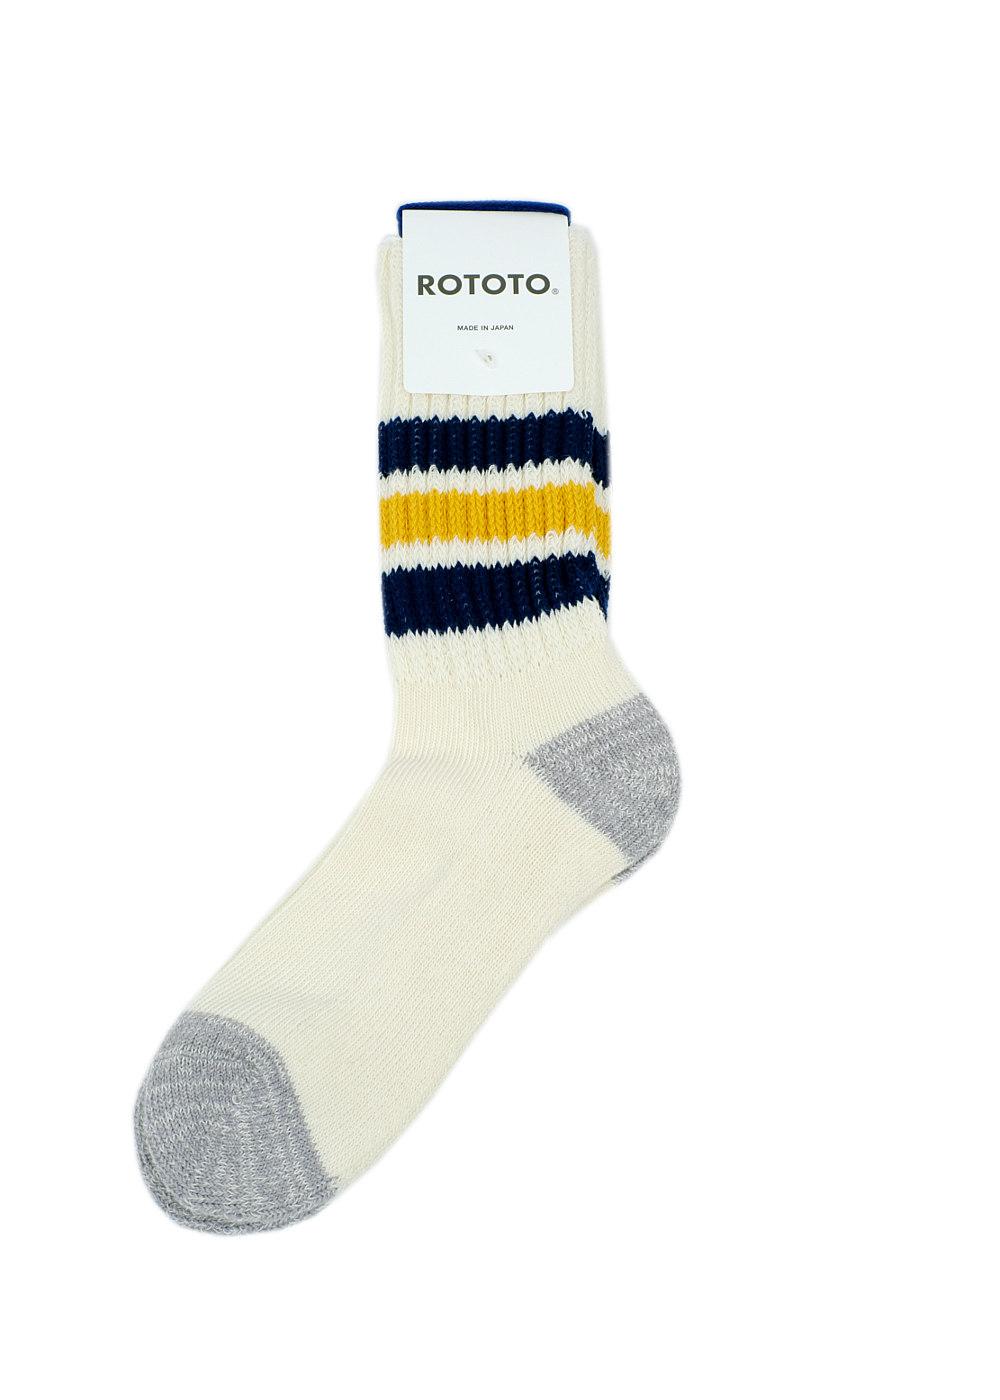 Rototo-coarse-ribbed-oldschool-socks-NavyYellow-01